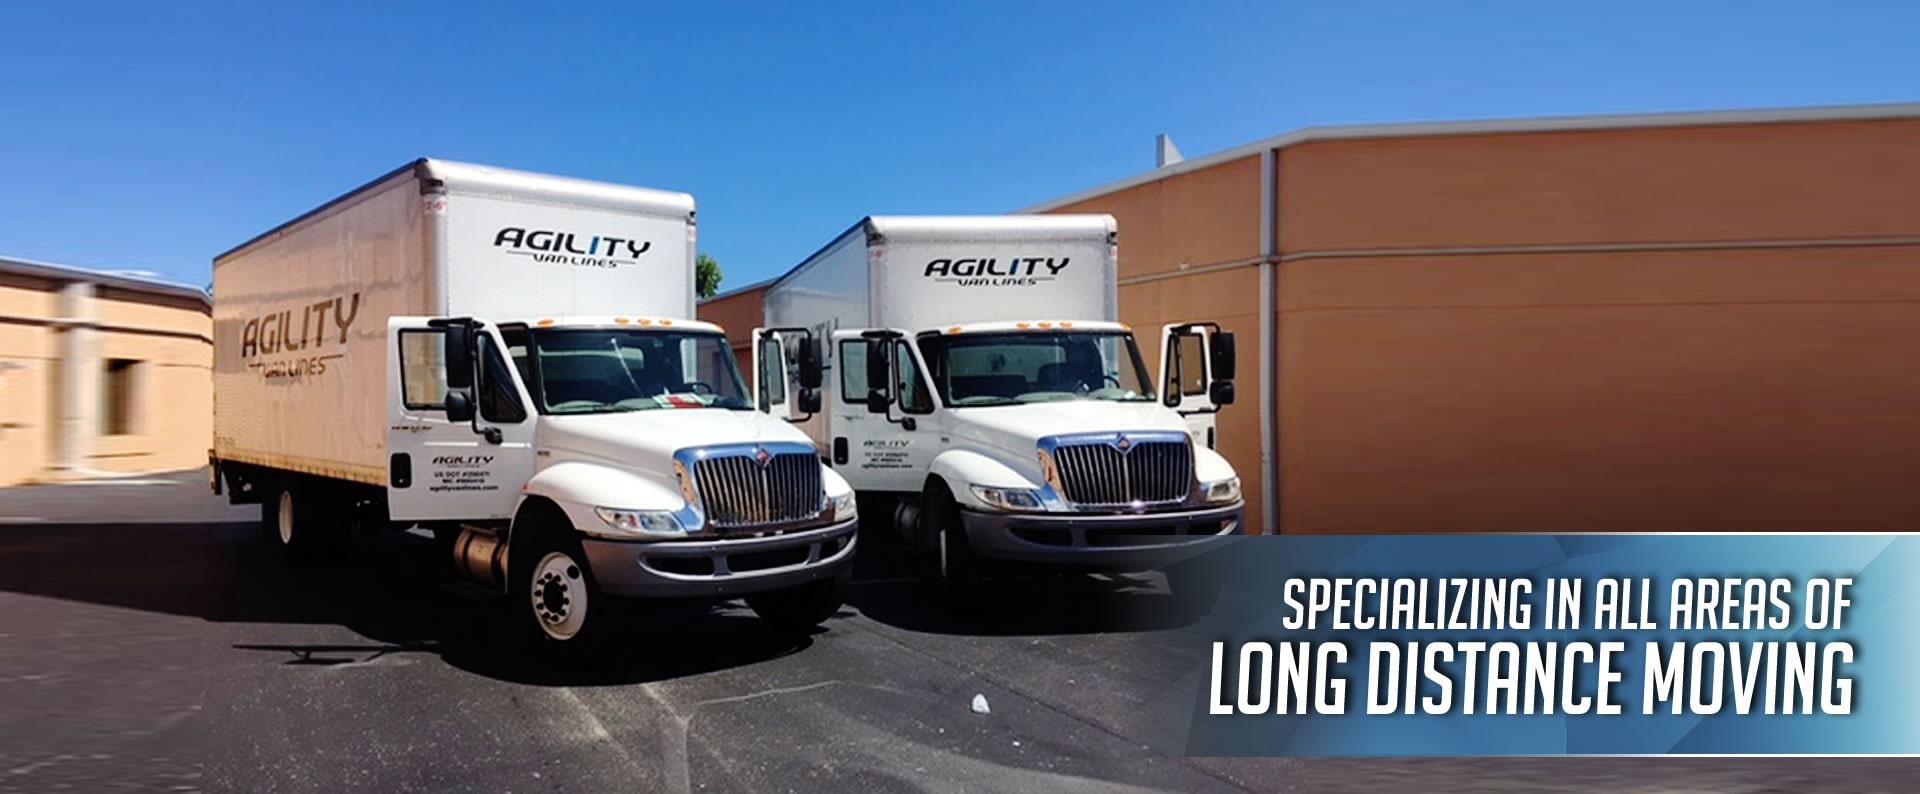 Agility Van Lines, Inc. image 0